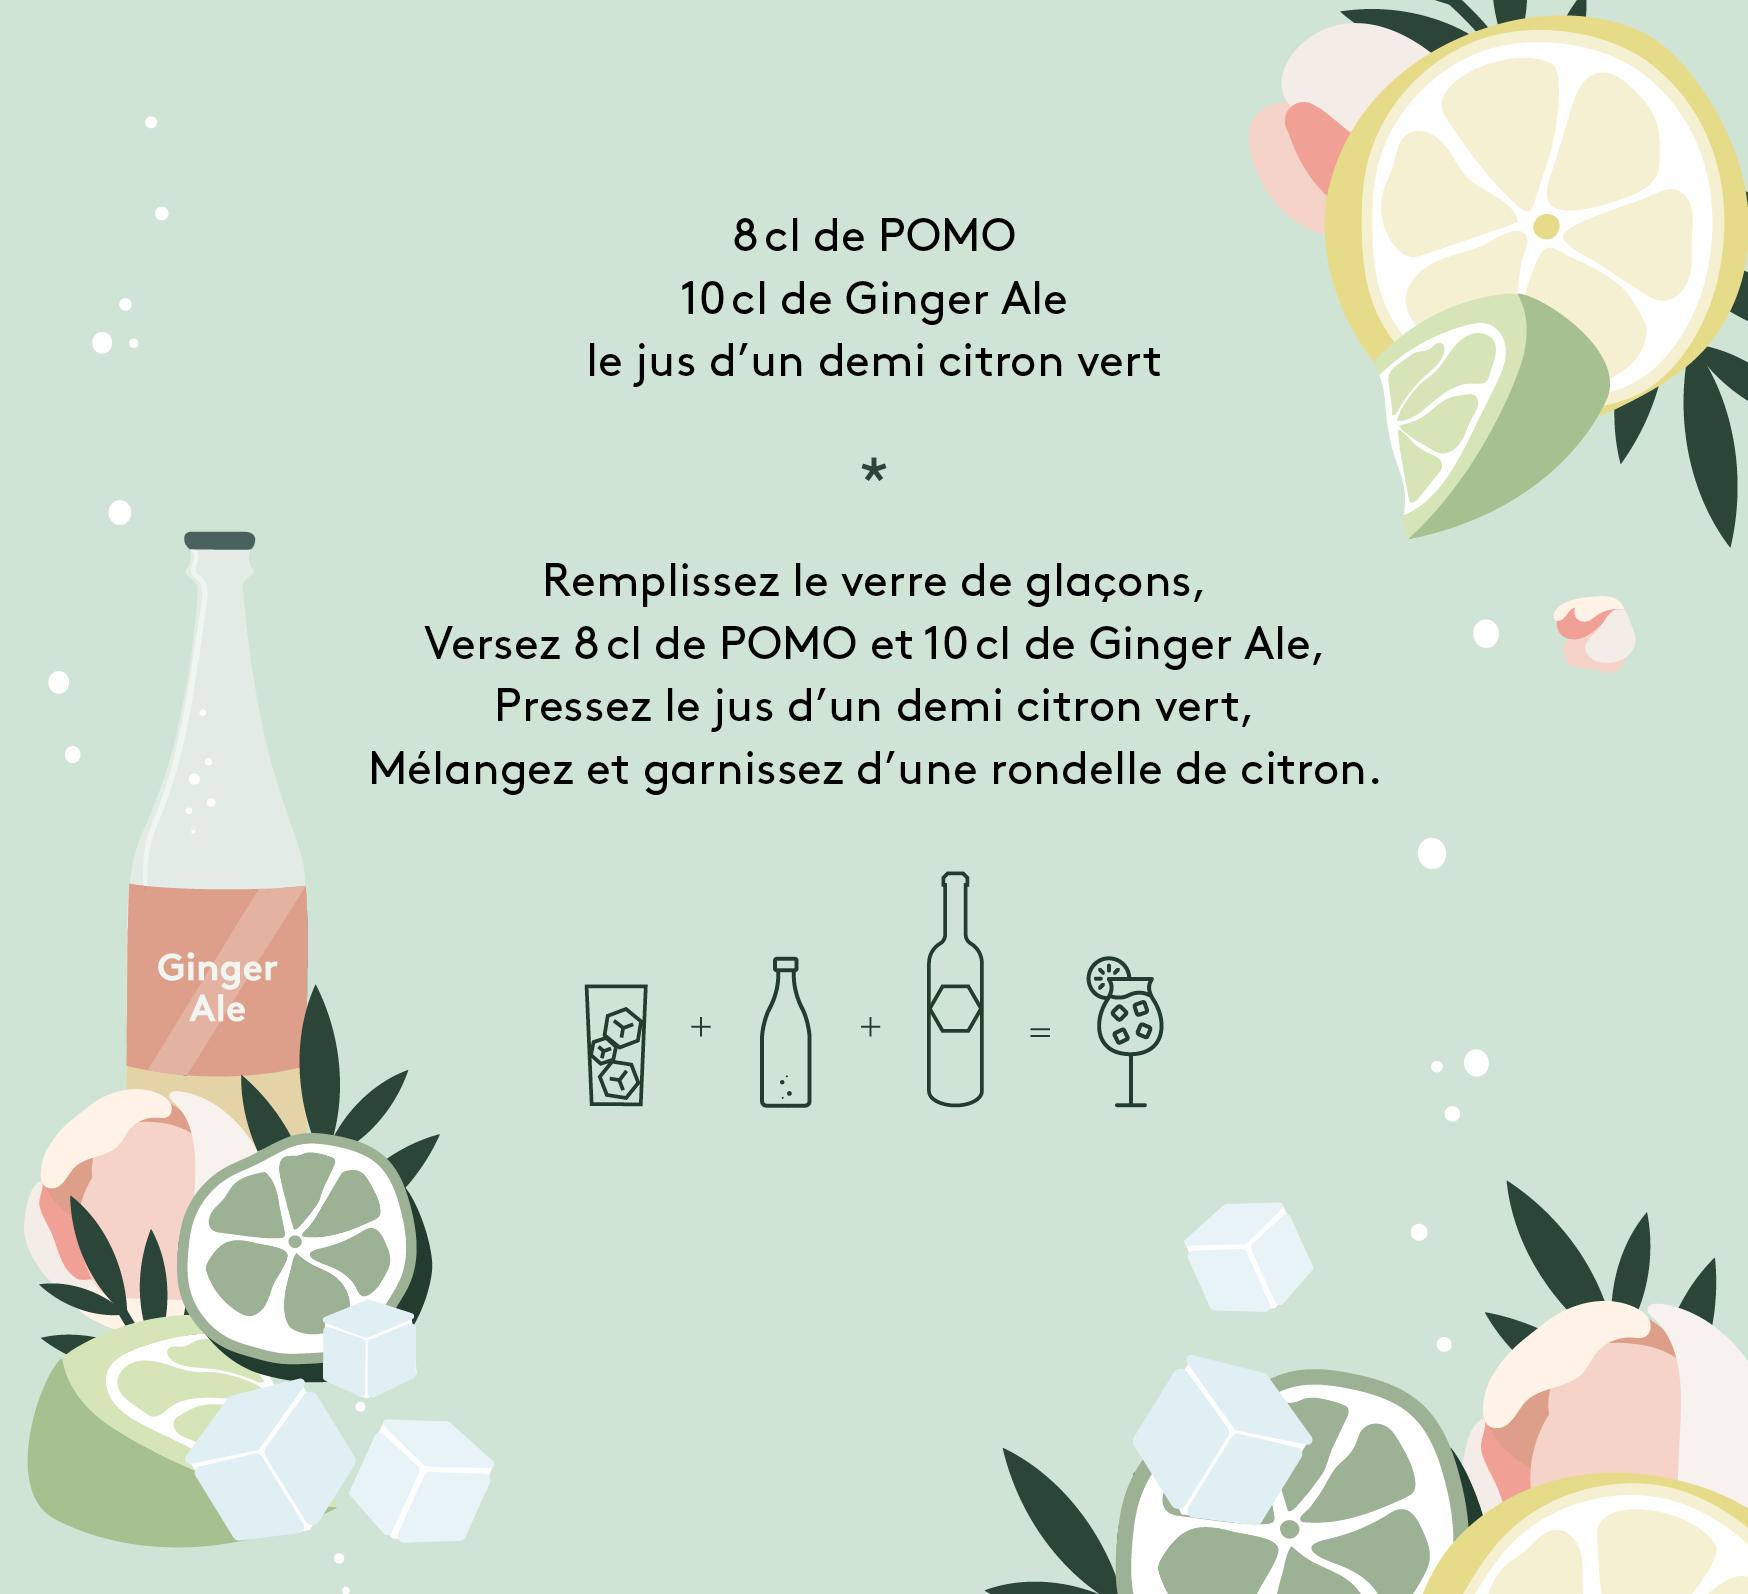 POMO-recette-cocktail-aperitif-club-ok.jpg